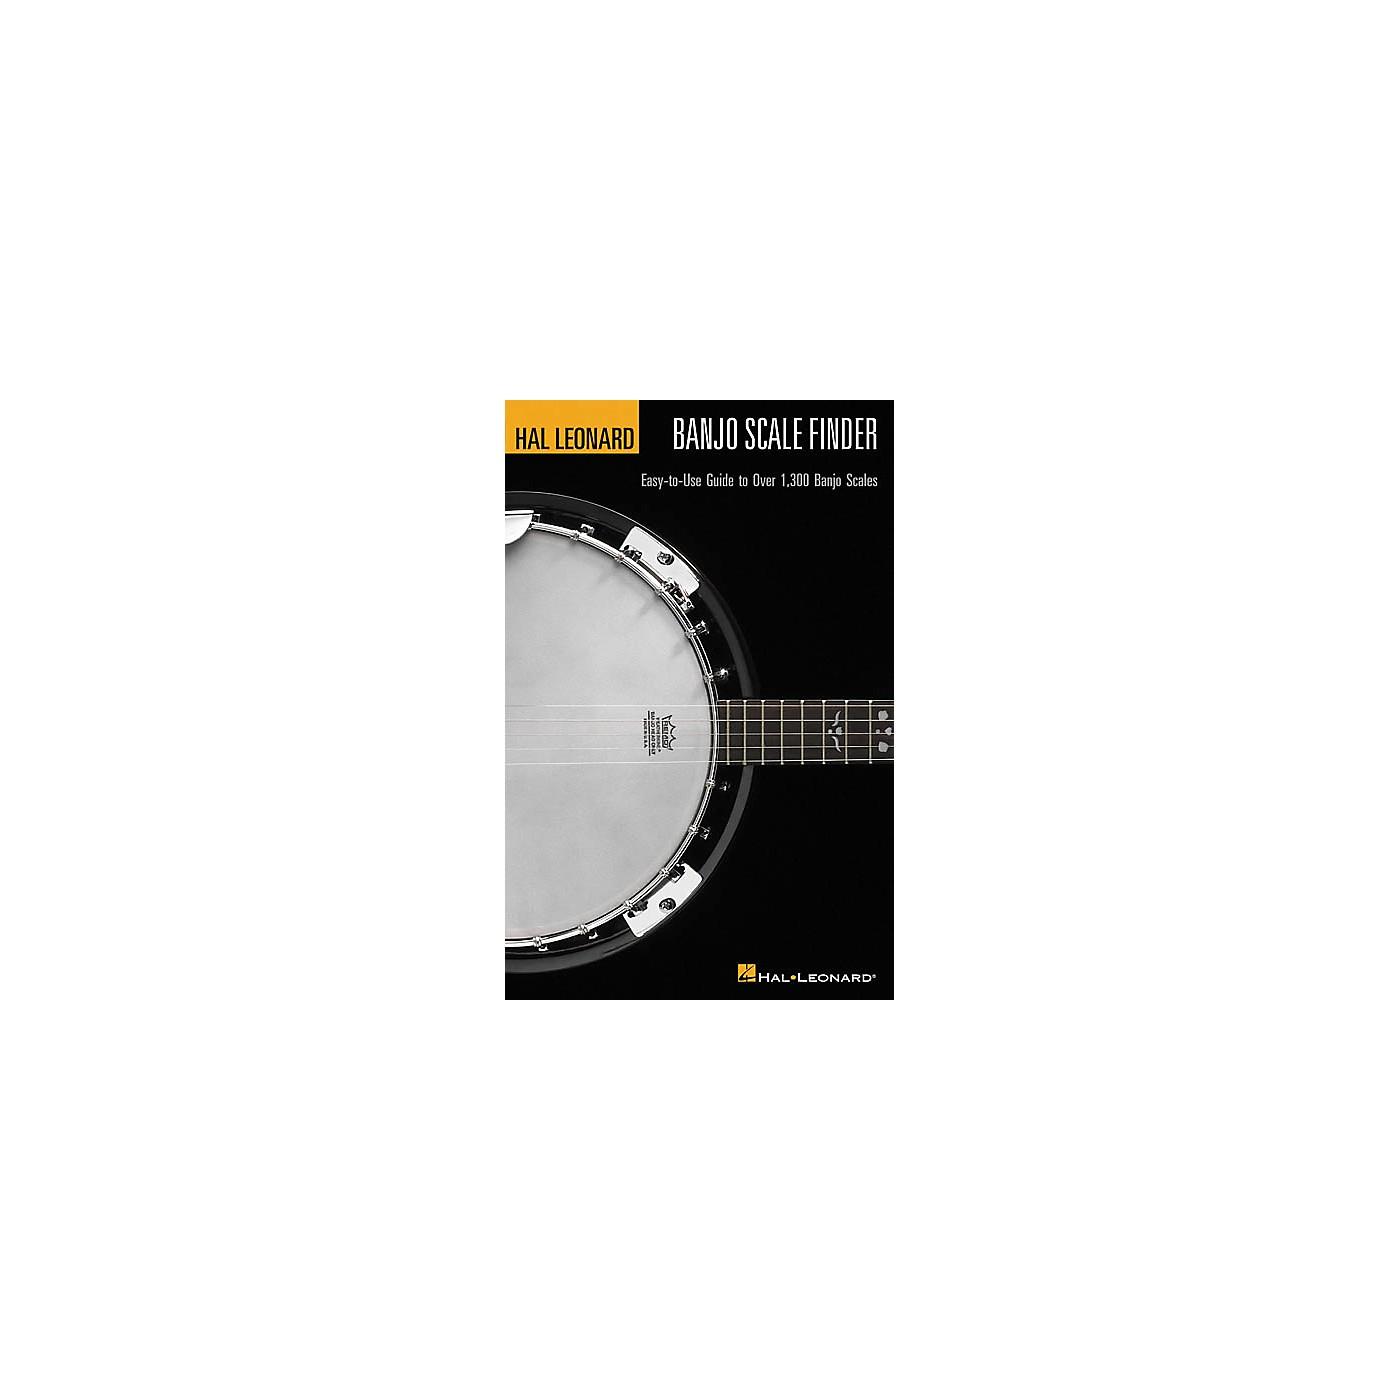 Hal Leonard Banjo Scale Finder 1300 Banjo Scales 6x9 Book thumbnail